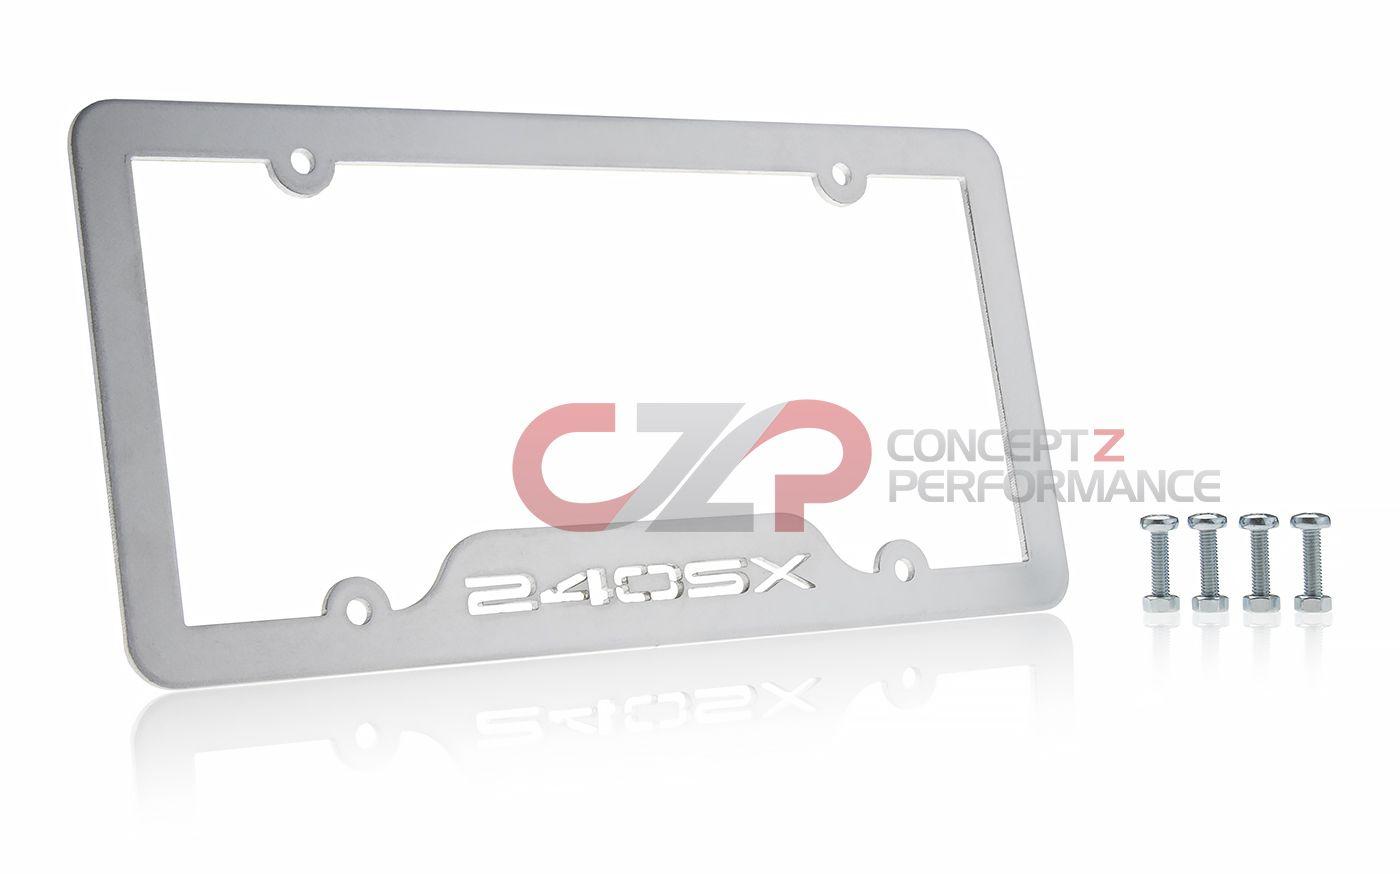 Apparel & Accessories :: License Frames - Concept Z Performance